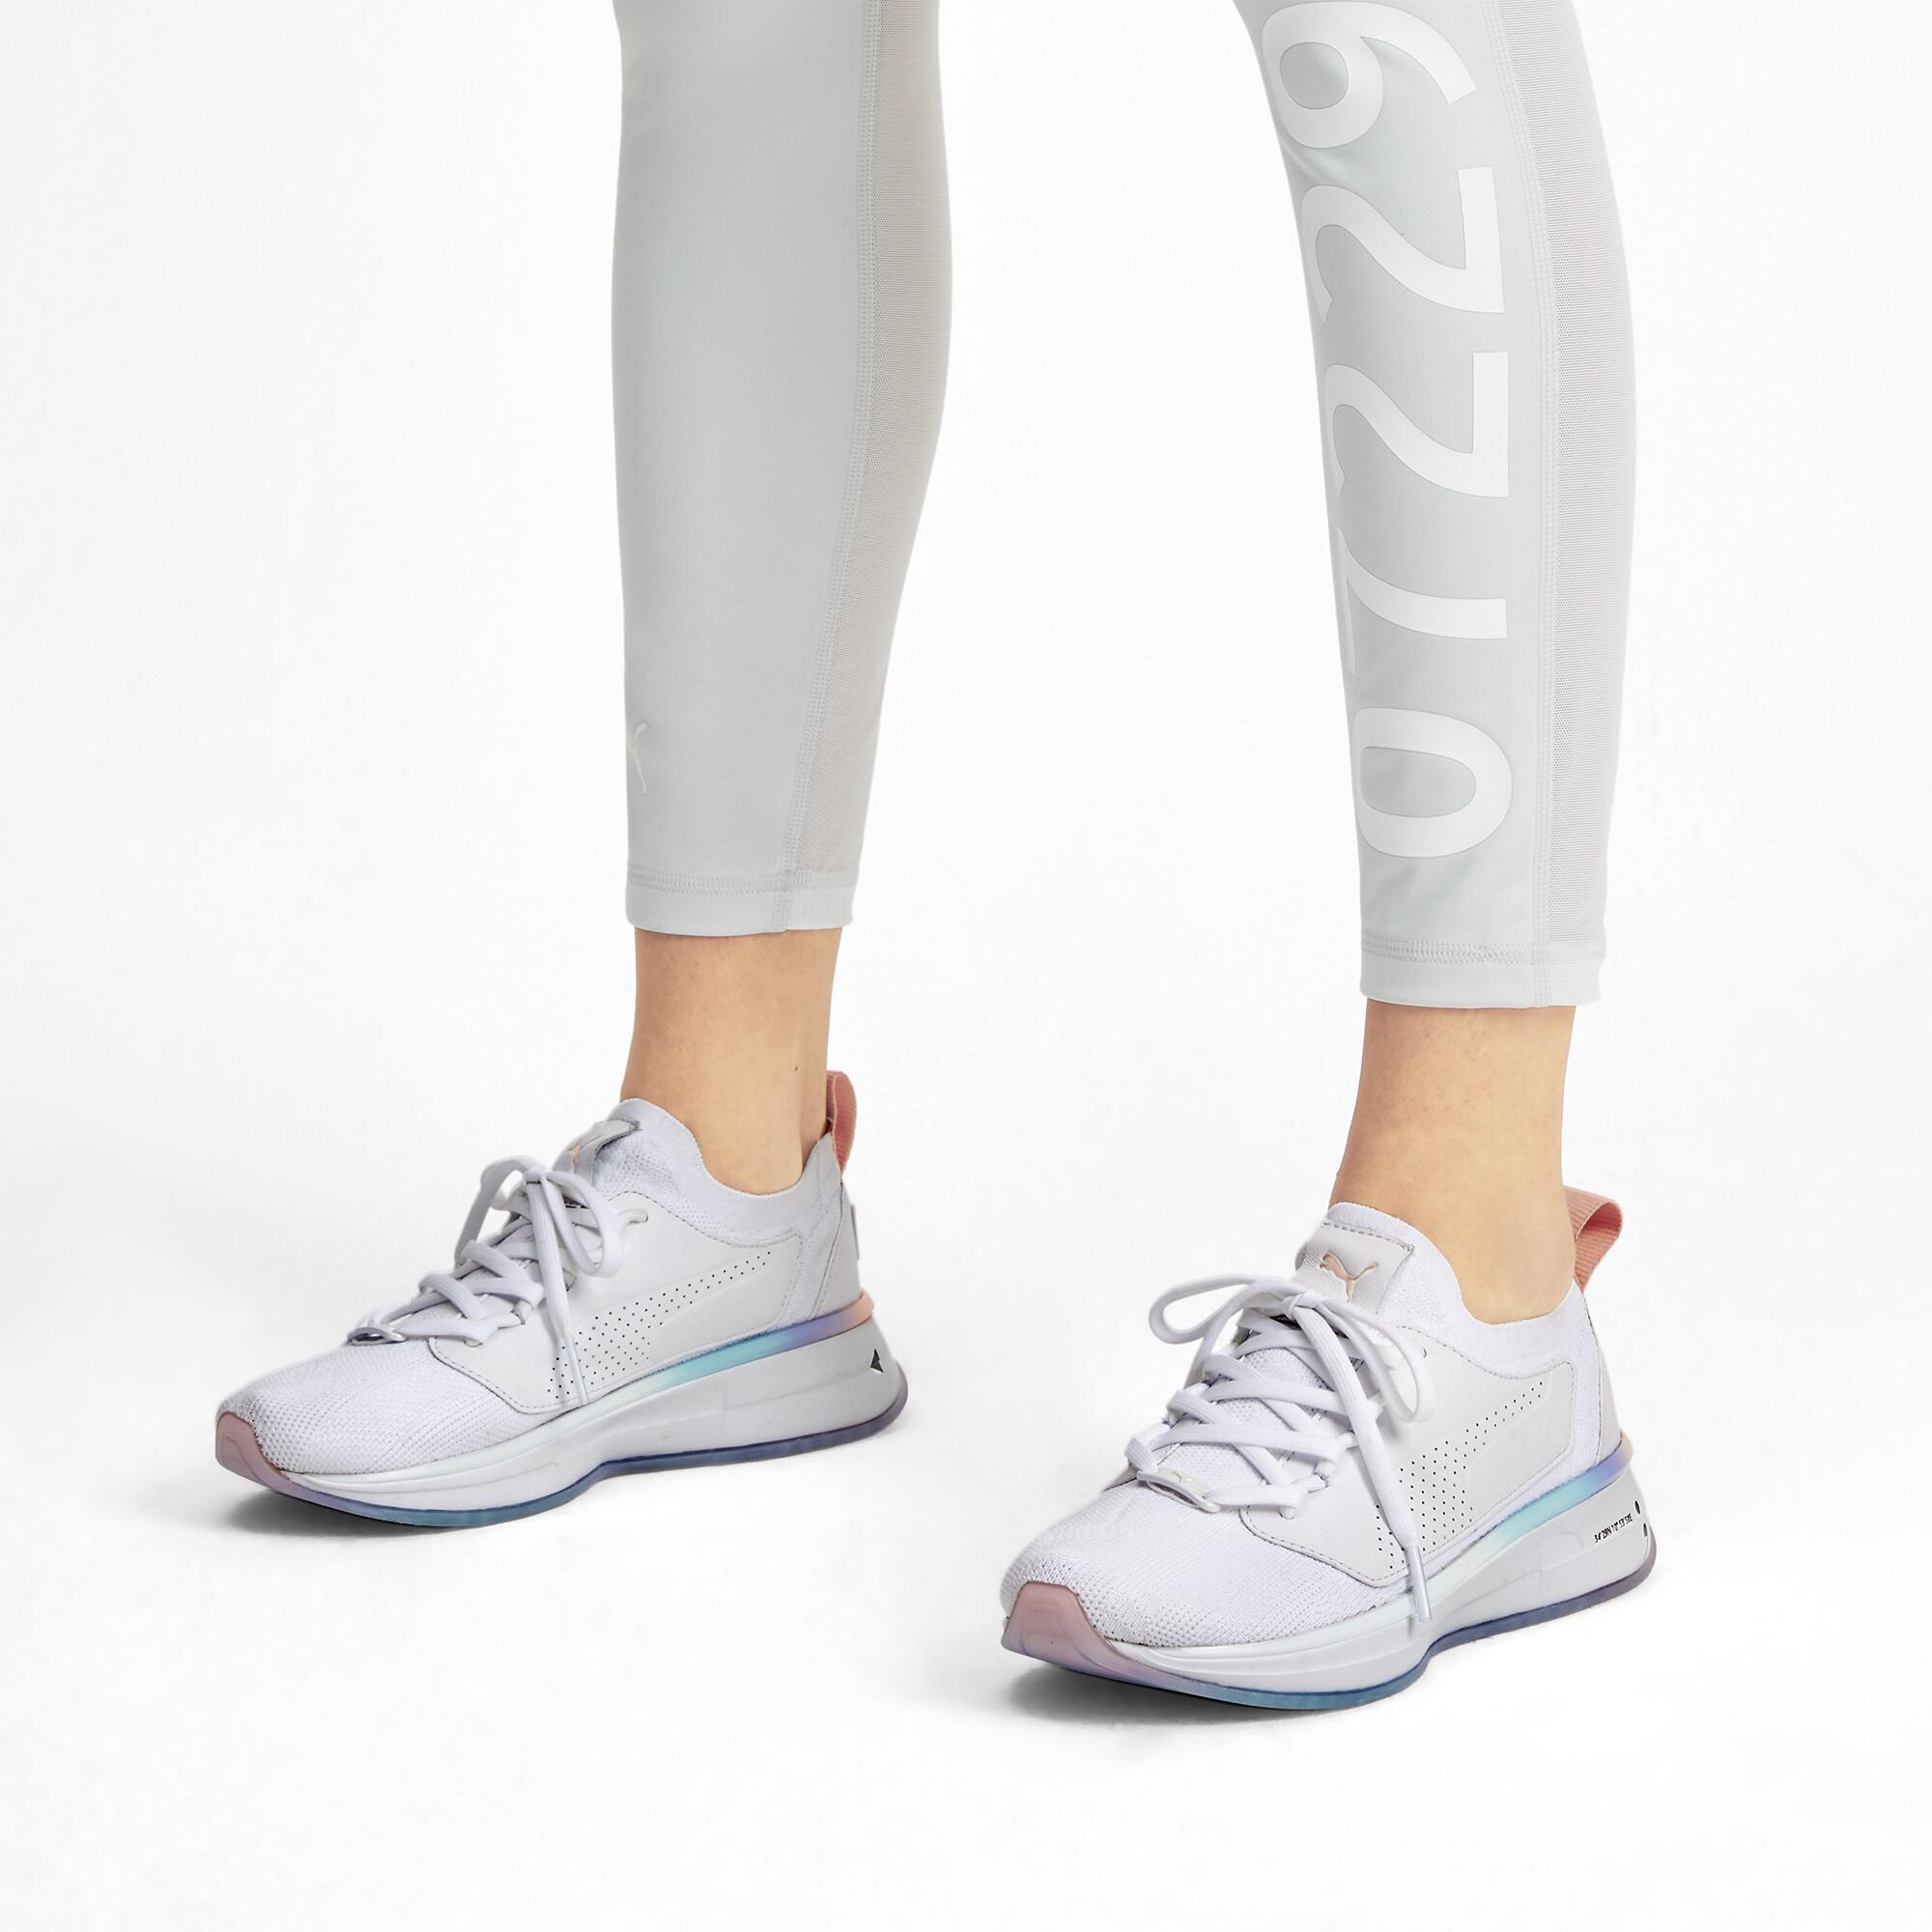 Image Puma PUMA x SELENA GOMEZ Runner Women's Training Shoes #2